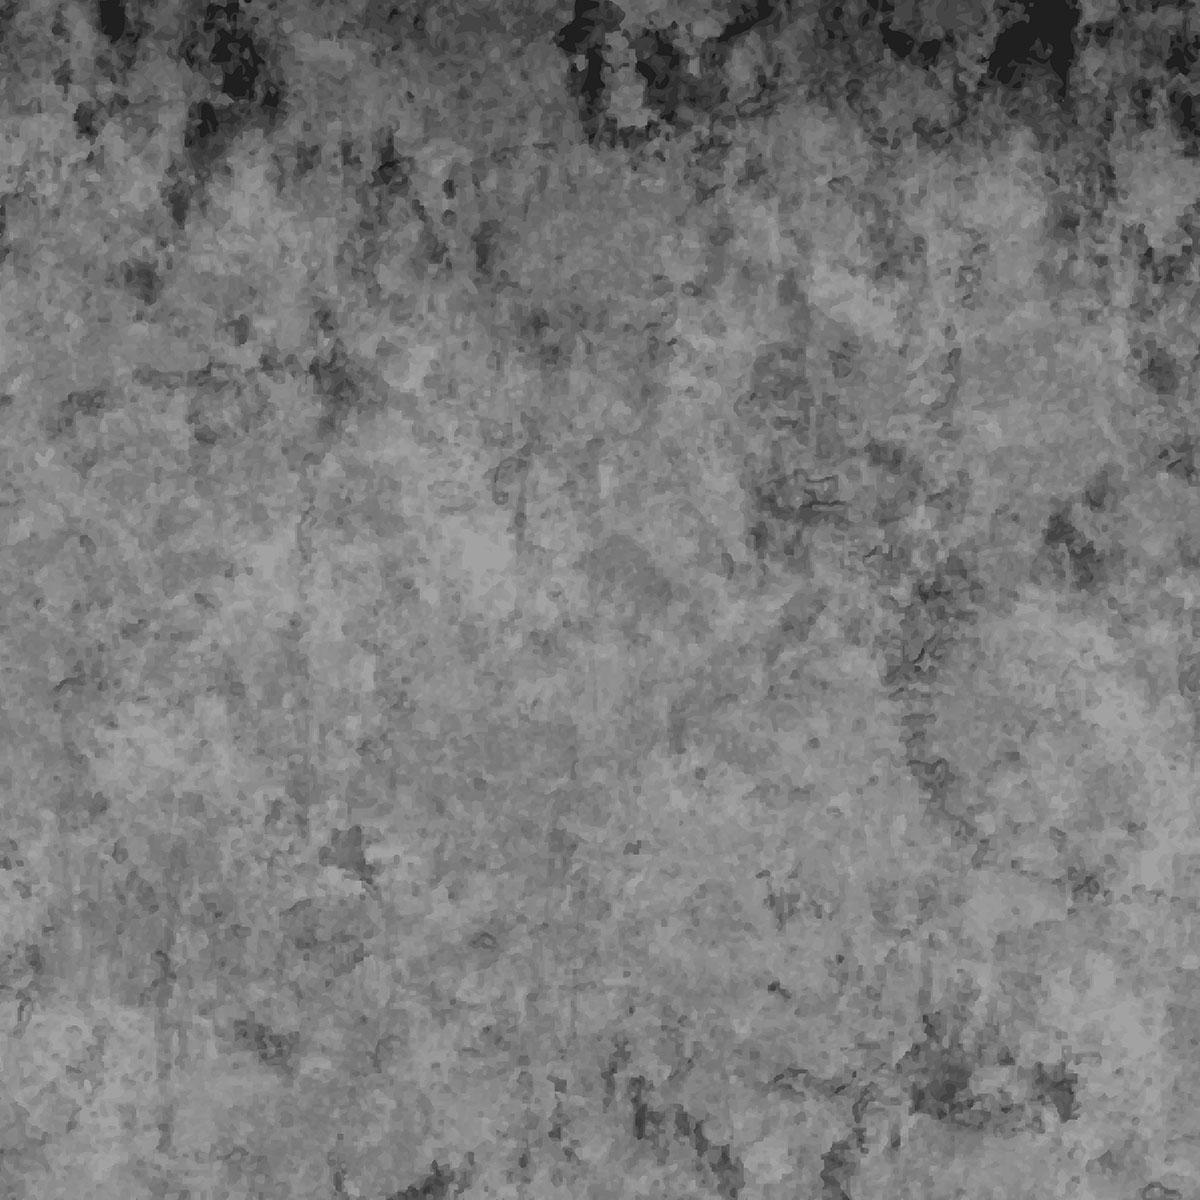 Detailed Concrete Texture Download Free Vector Art